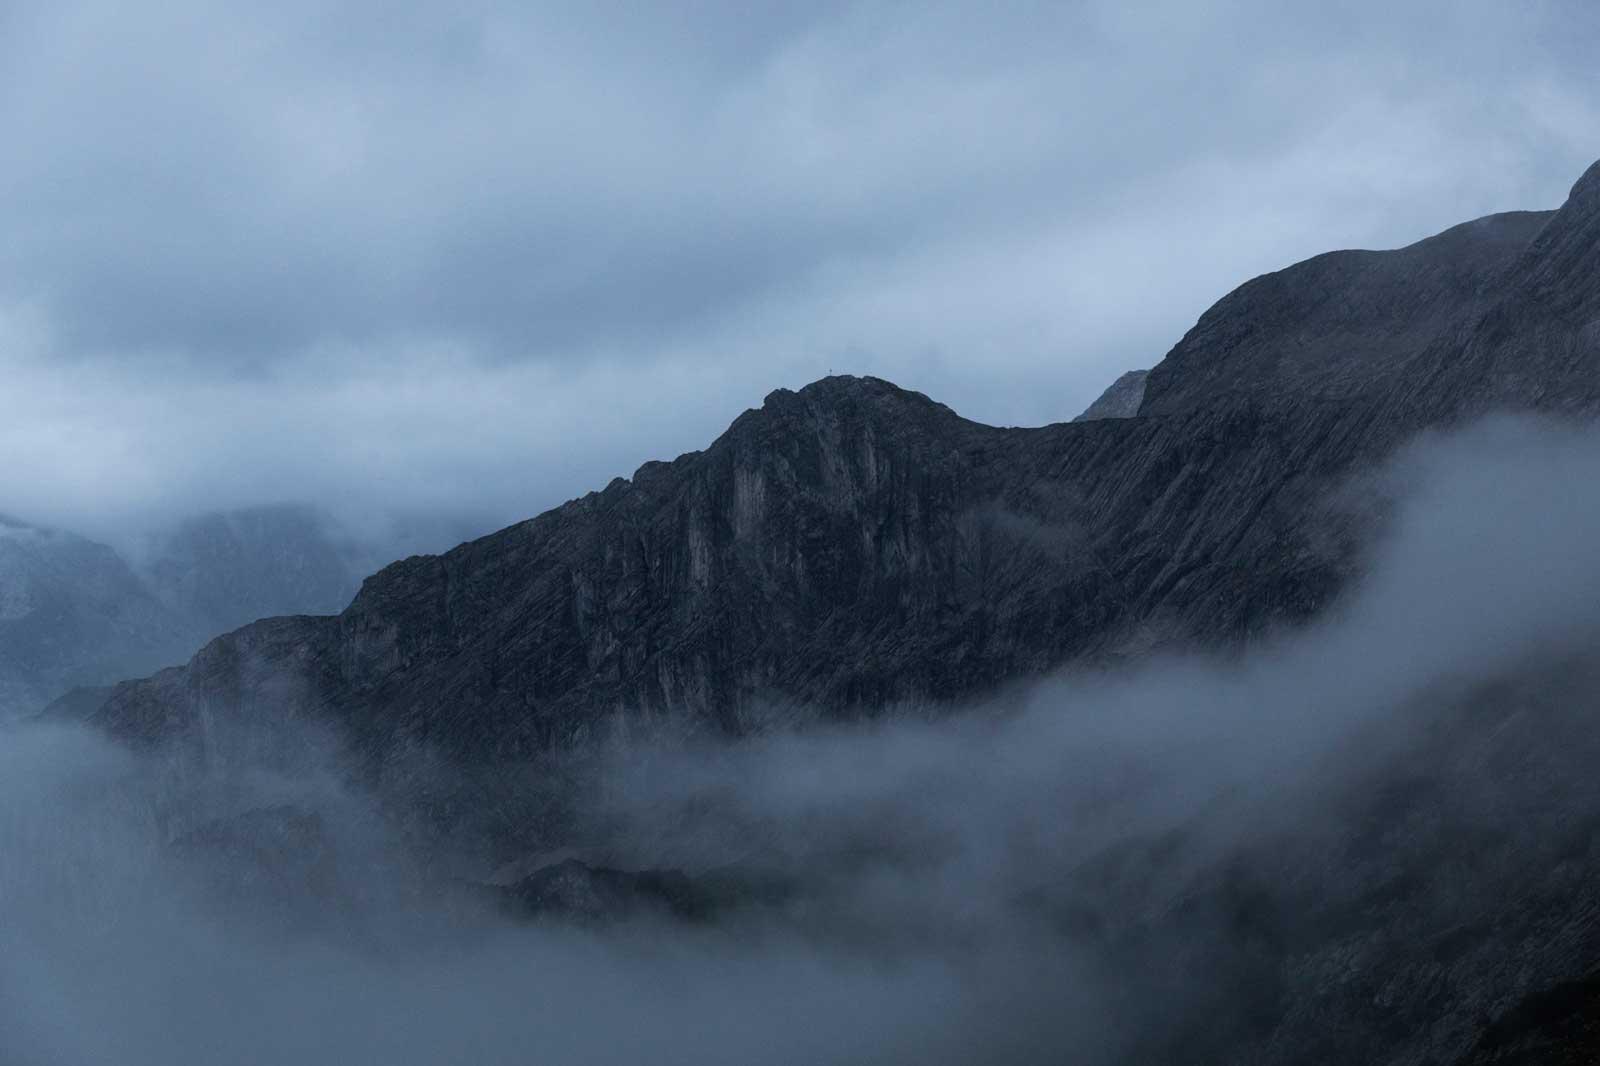 munichmountaingirls-bergzeit-alpincamp-Nebel-um-den-Bernadeinkopf-am-frühen-Morgen